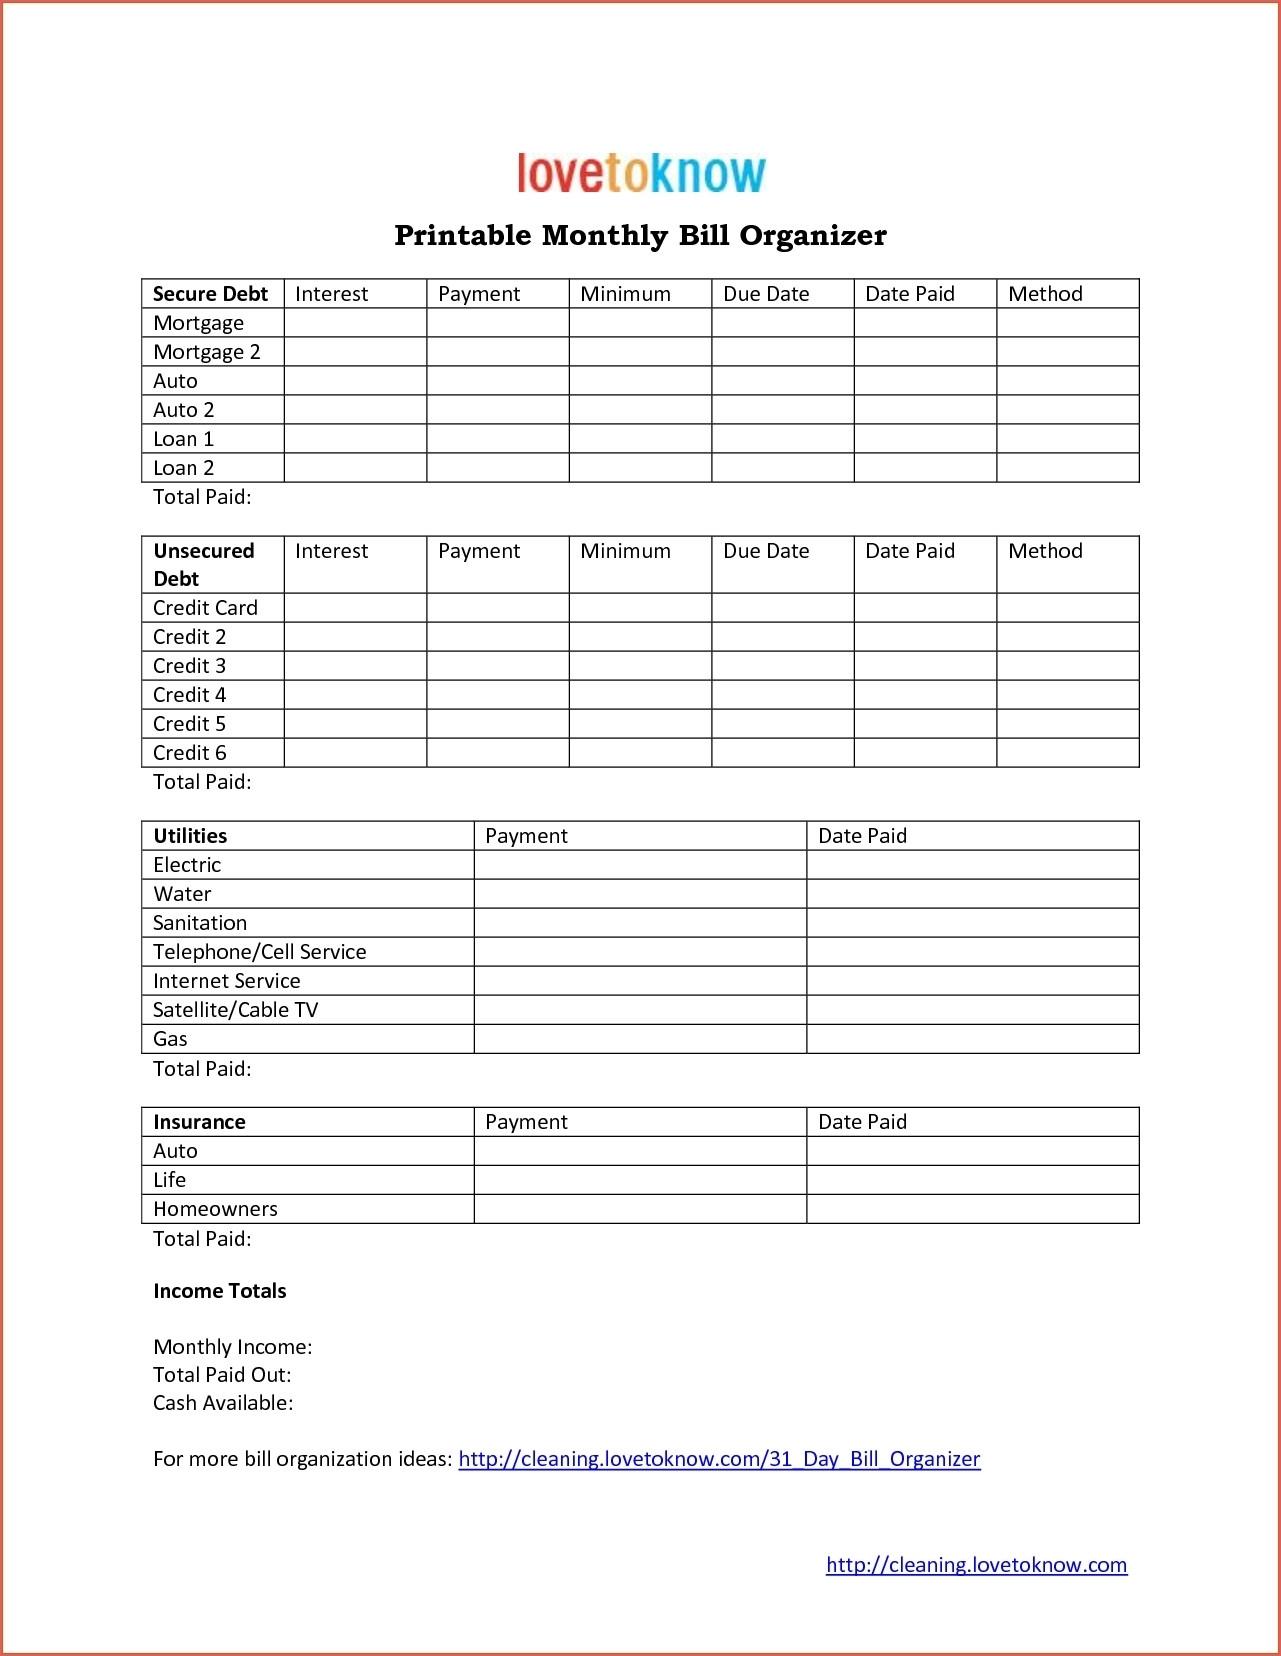 Printable Monthly Bill Calendar Bills Organizer Template Online with regard to Bill Due Date Calendar Printable